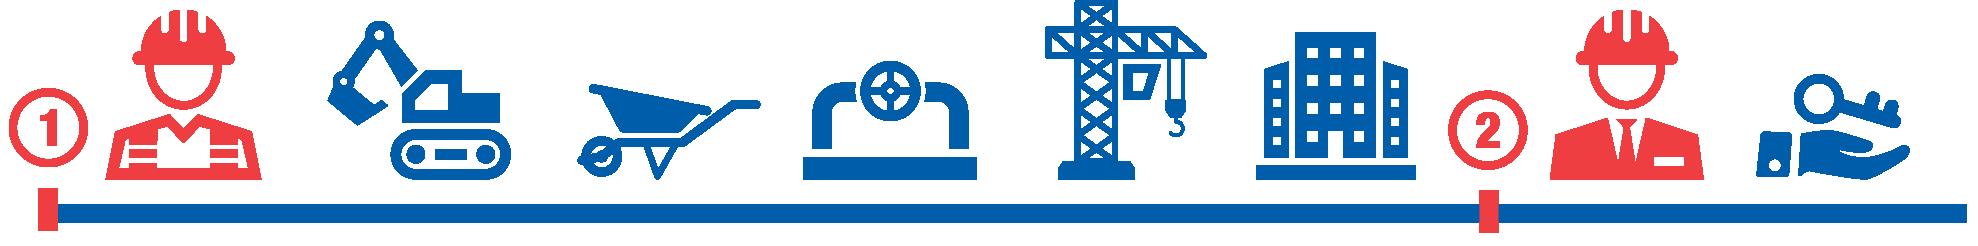 fn-buvniecibas-audits3-03